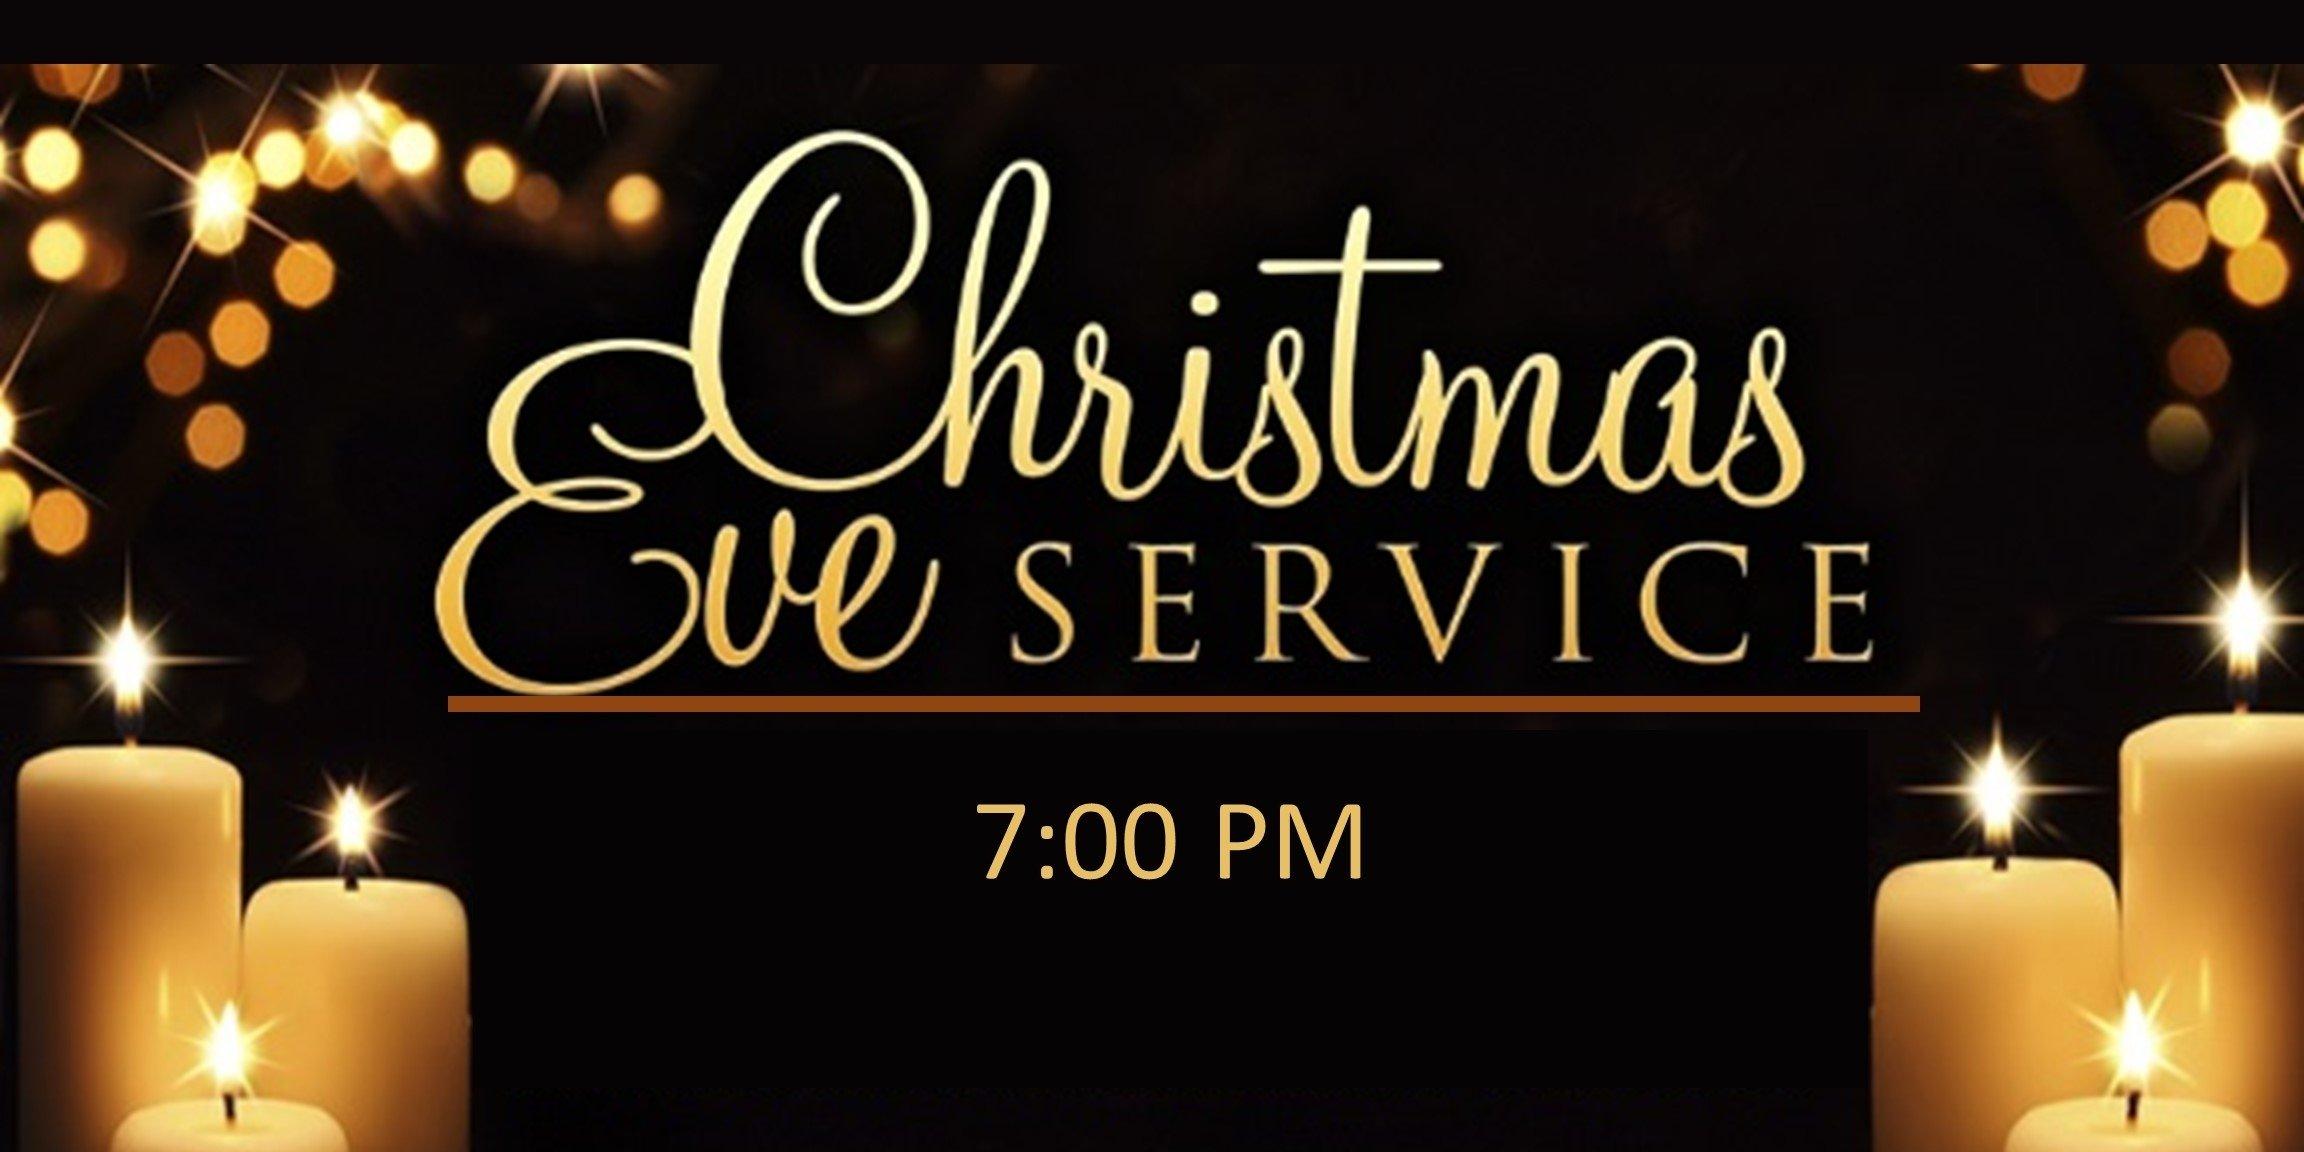 10 Great Christmas Eve Worship Service Ideas christmas eve service listings 105 9 shinefm 1 2020